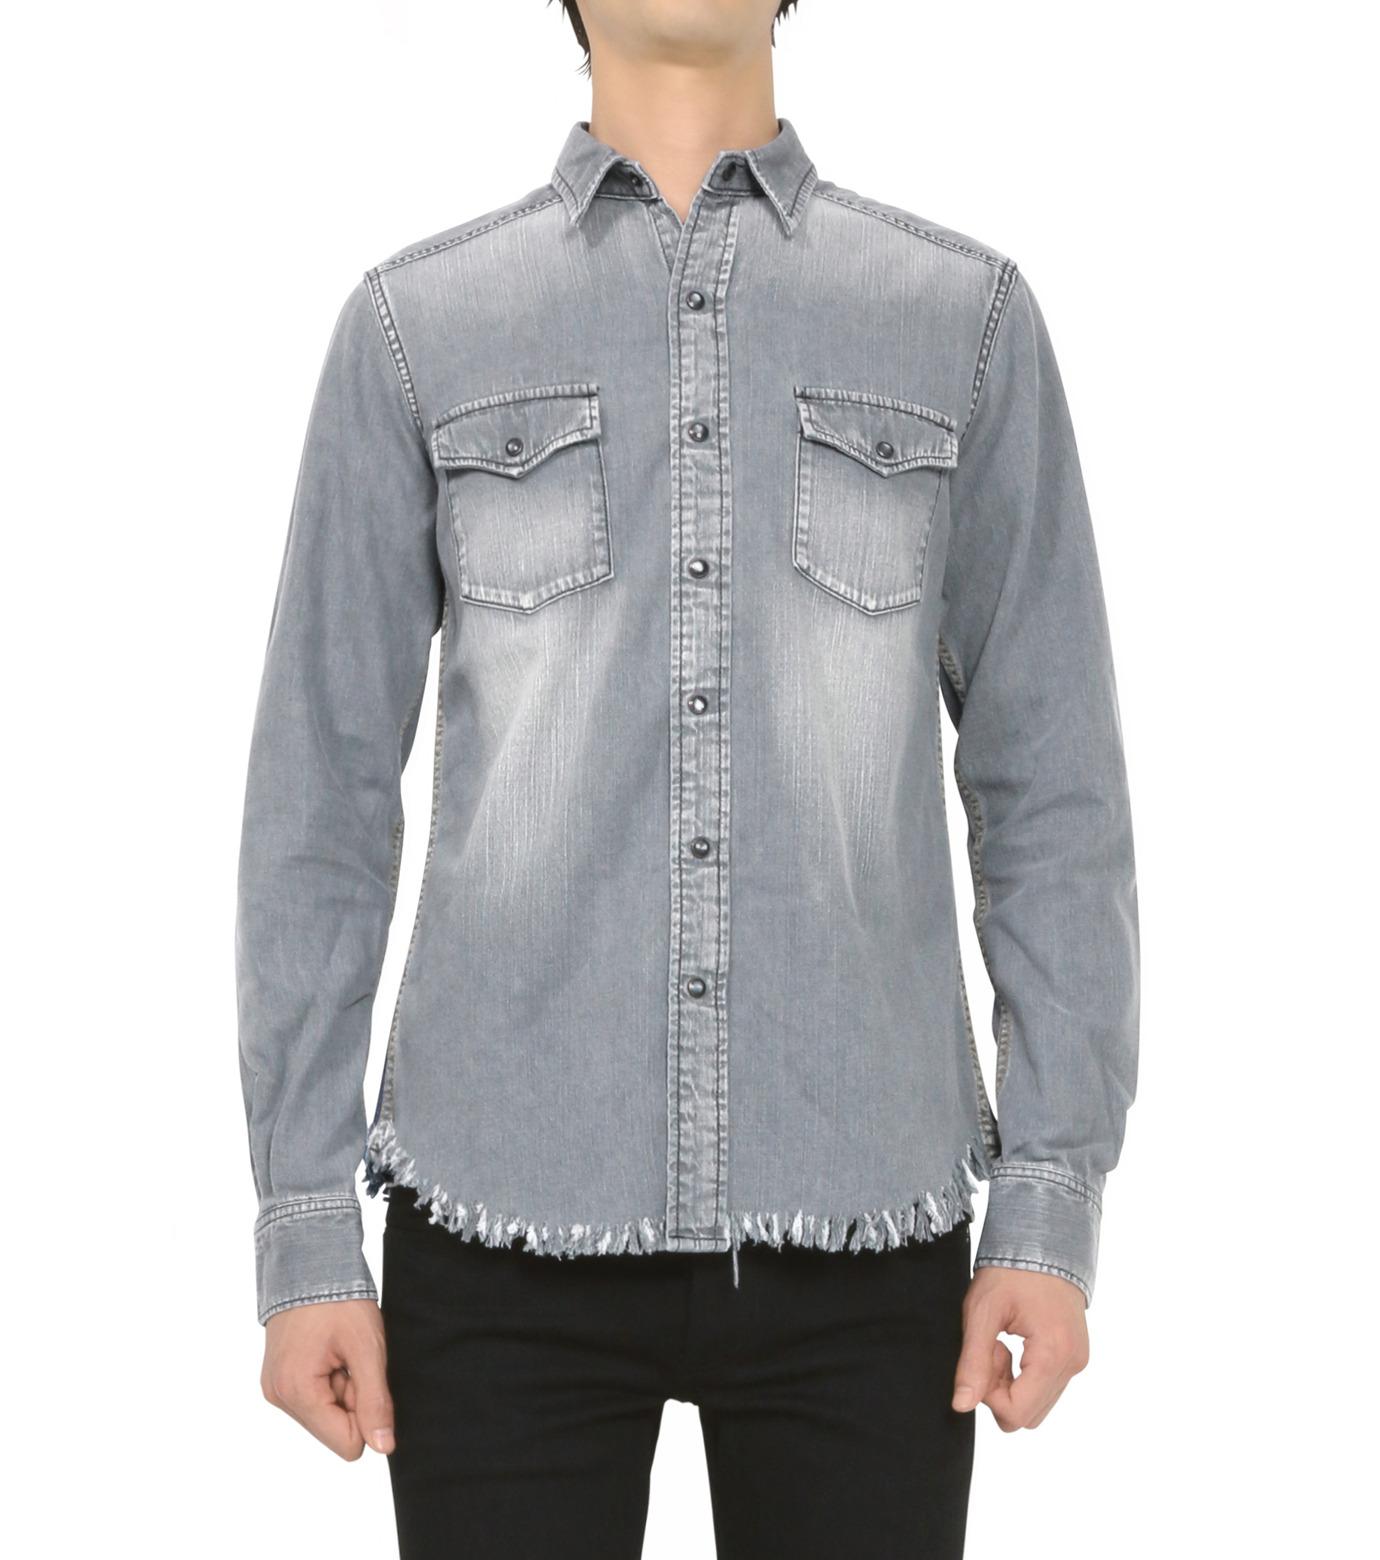 HL HEDDIE LOVU(エイチエル・エディールーヴ)のBK DENIM WASH SHIRT-GRAY(シャツ/shirt)-18S93004-11 拡大詳細画像3